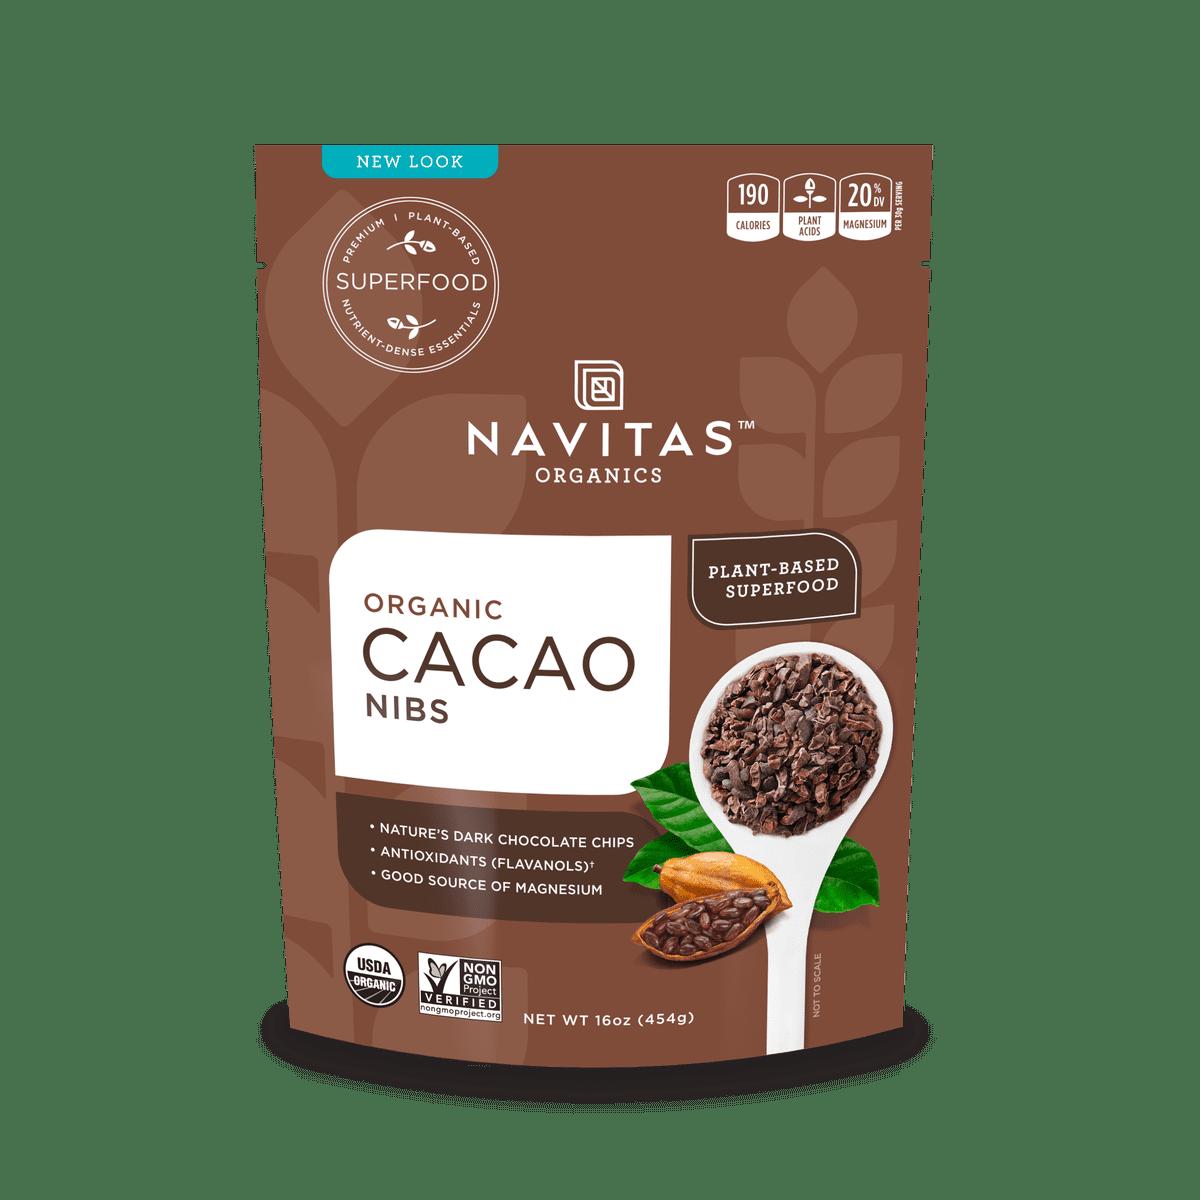 Navitas Organics Cacao Nibs, 1.0 Lb, 15 Servings